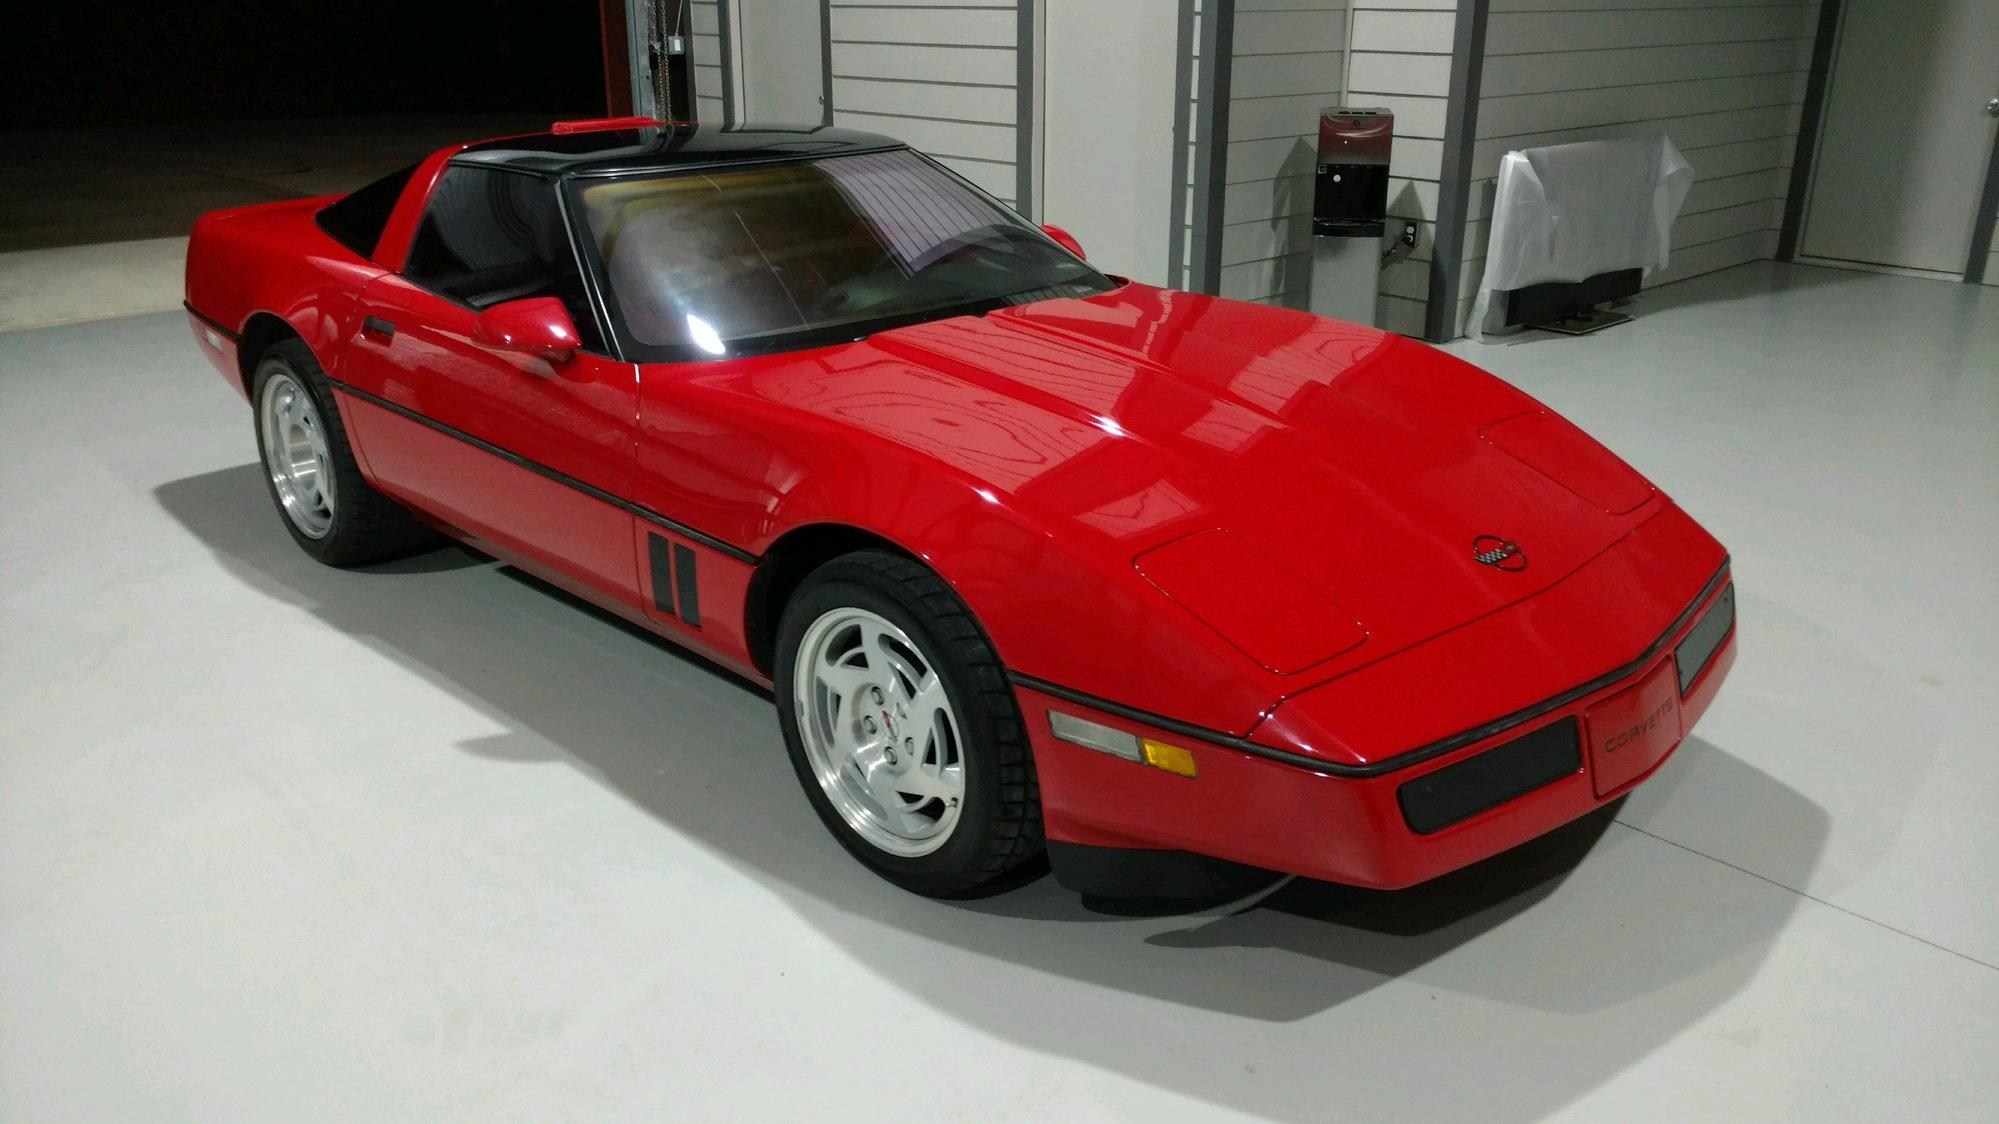 C4 Corvette For Sale Houston Tx: FS (For Sale) For Sale: 1990 C4 ZR1 With 30K Miles